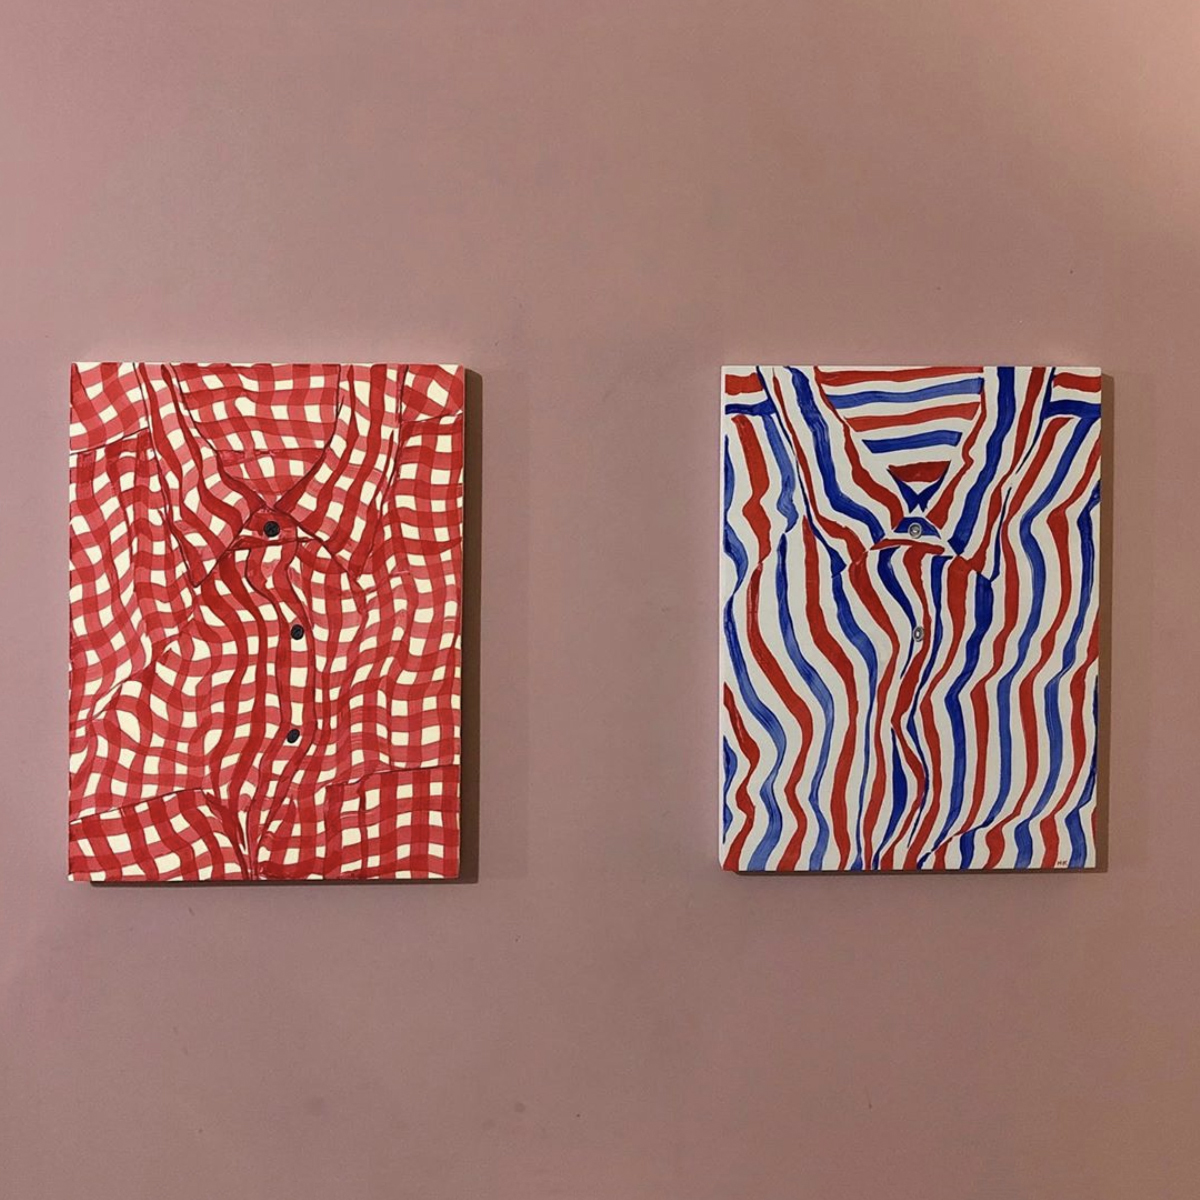 CollectifTextile_Hannah-Knox – Duo Shirts